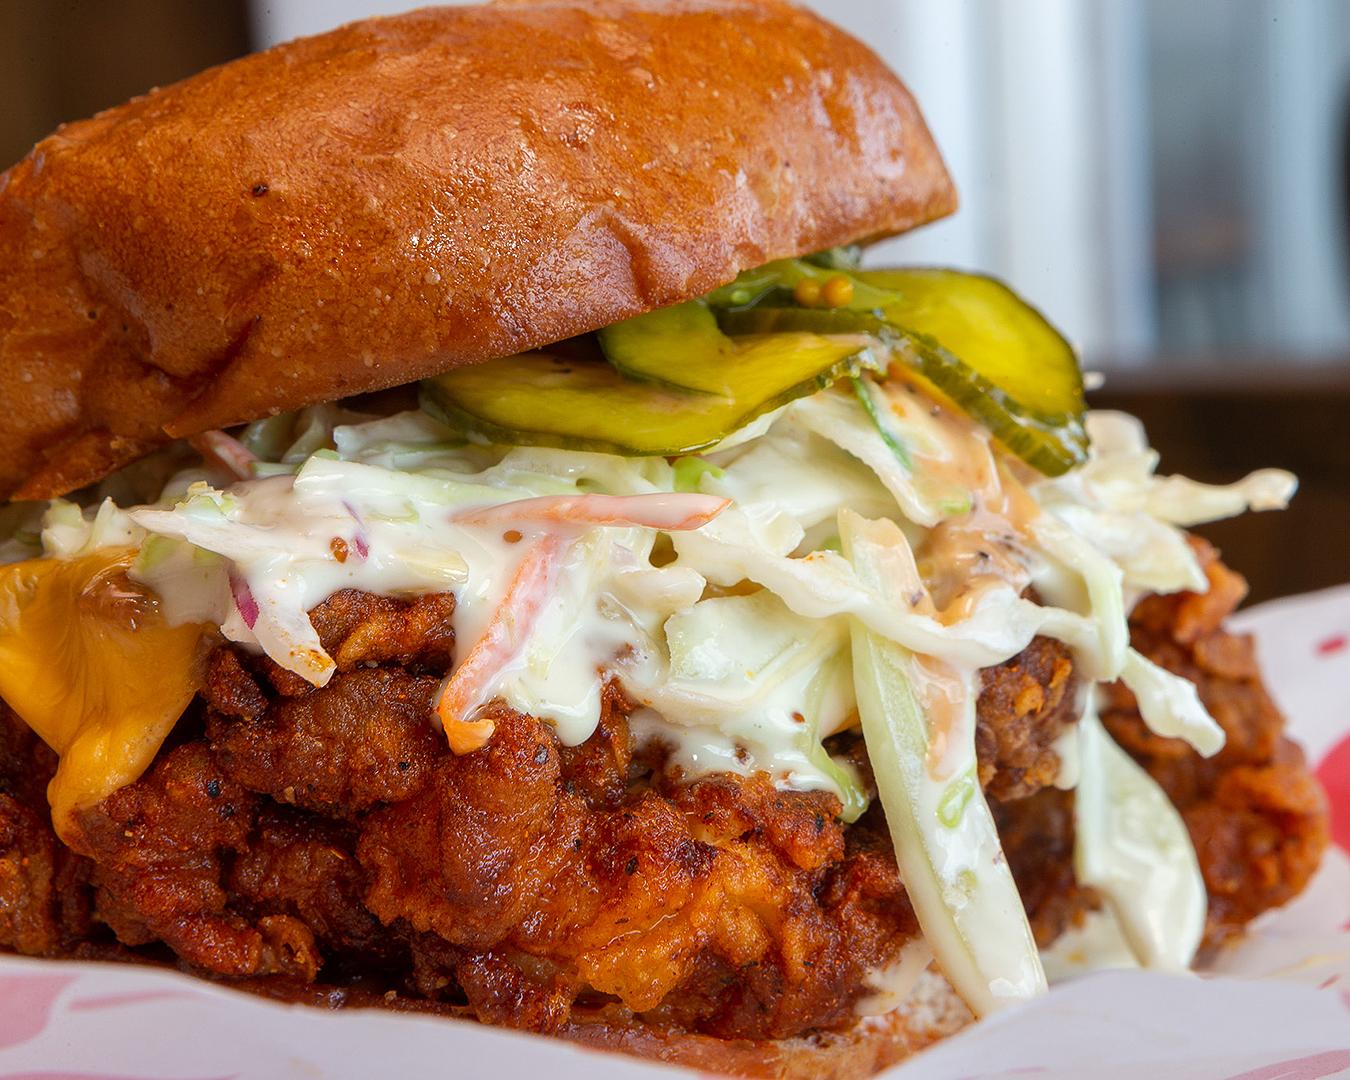 The behemoth baller sandwich at Peach's Hot Chicken